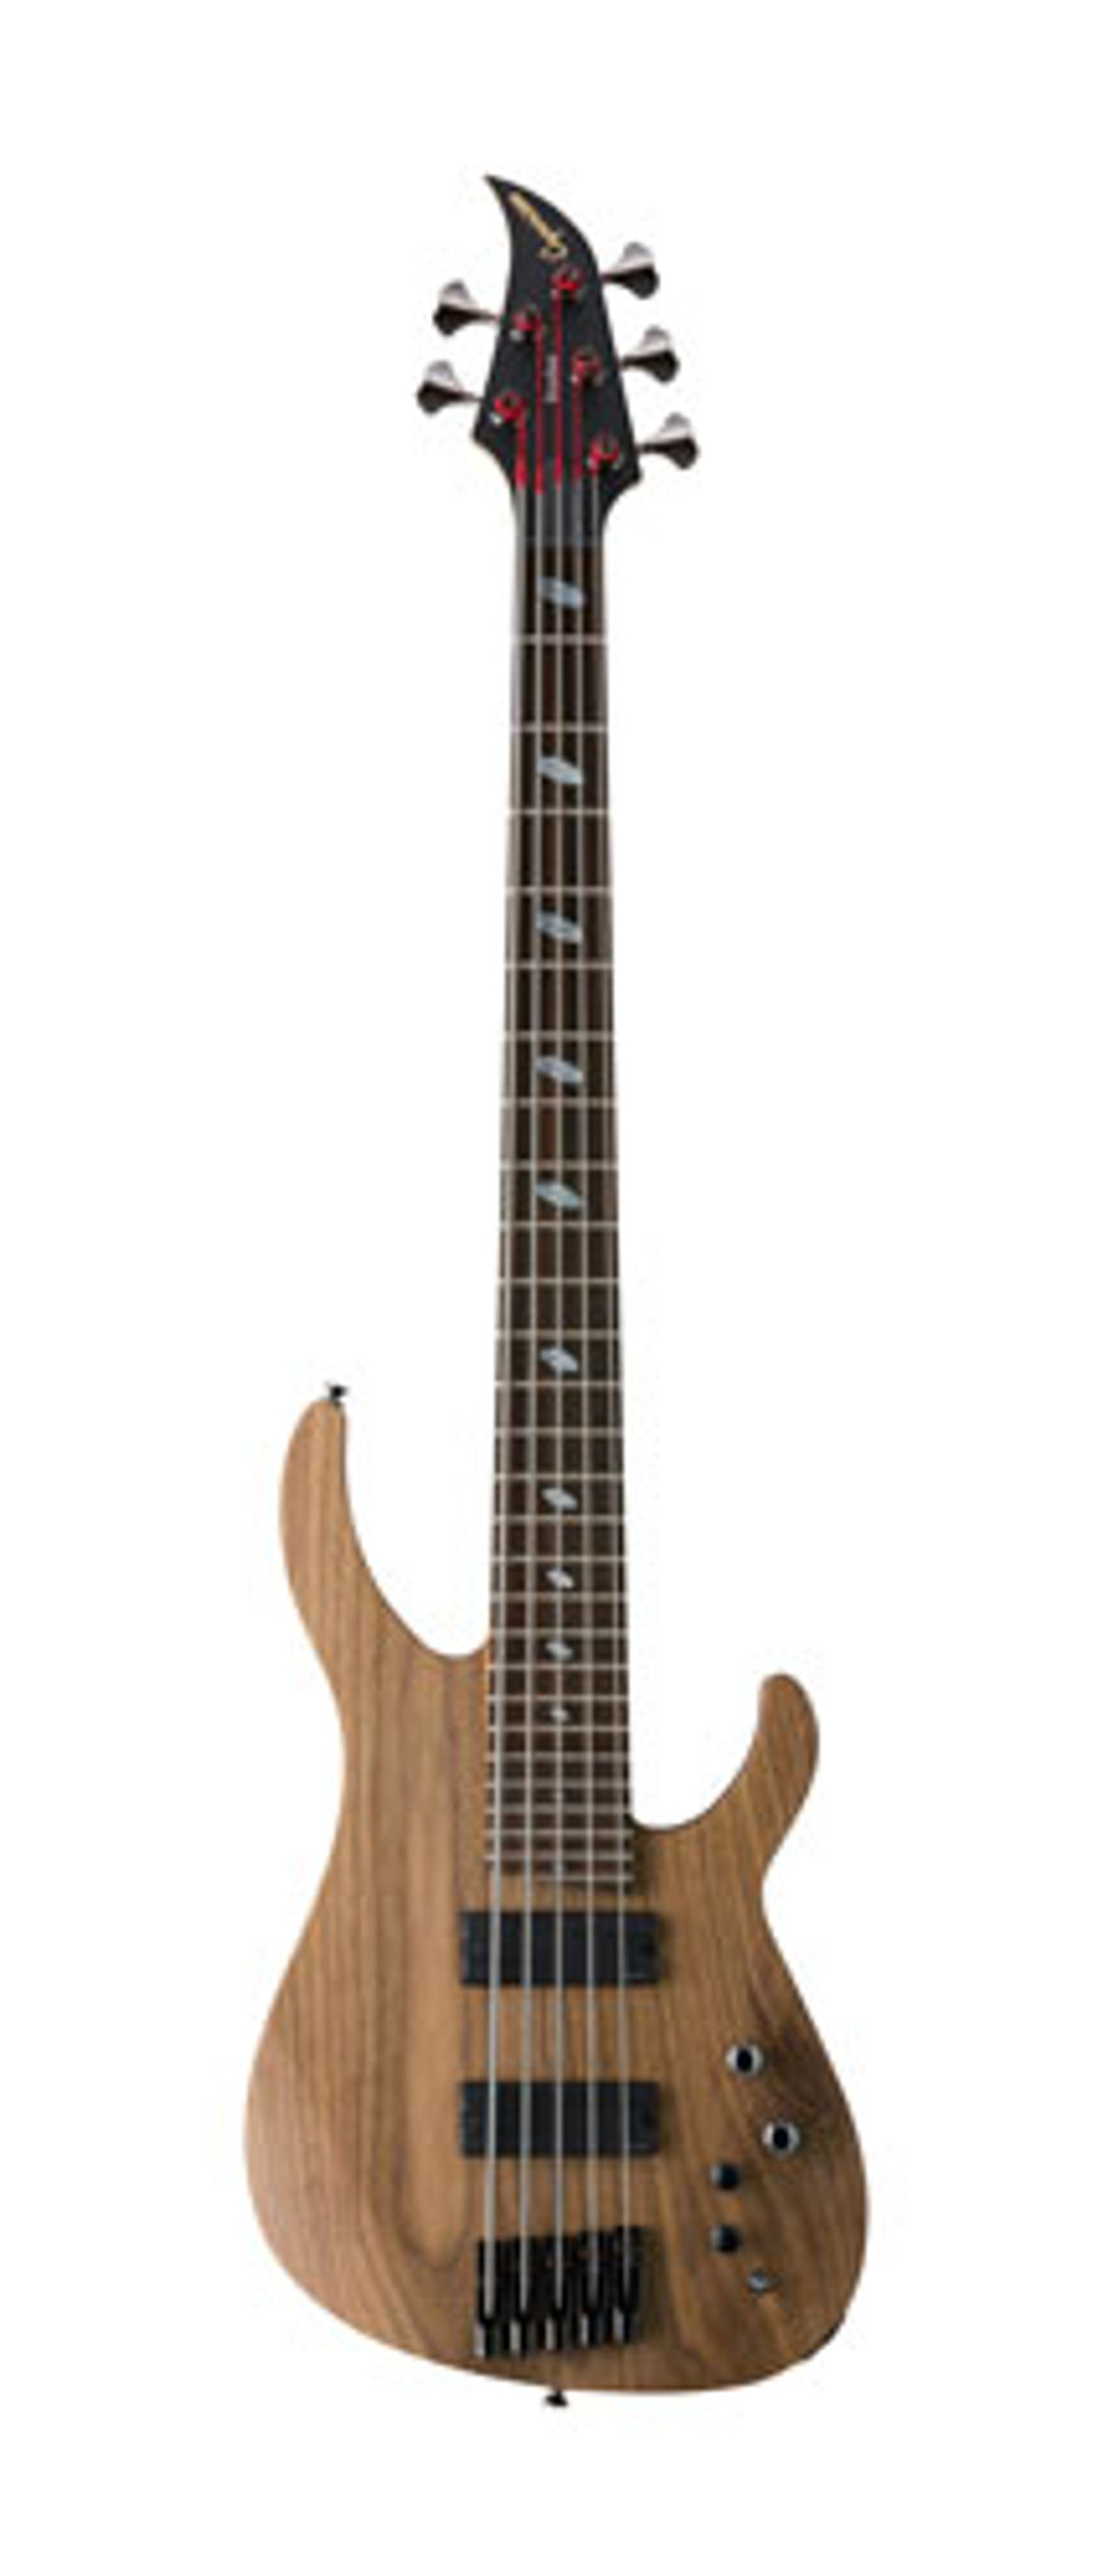 Caparison Launches the Brocken 5-Bass